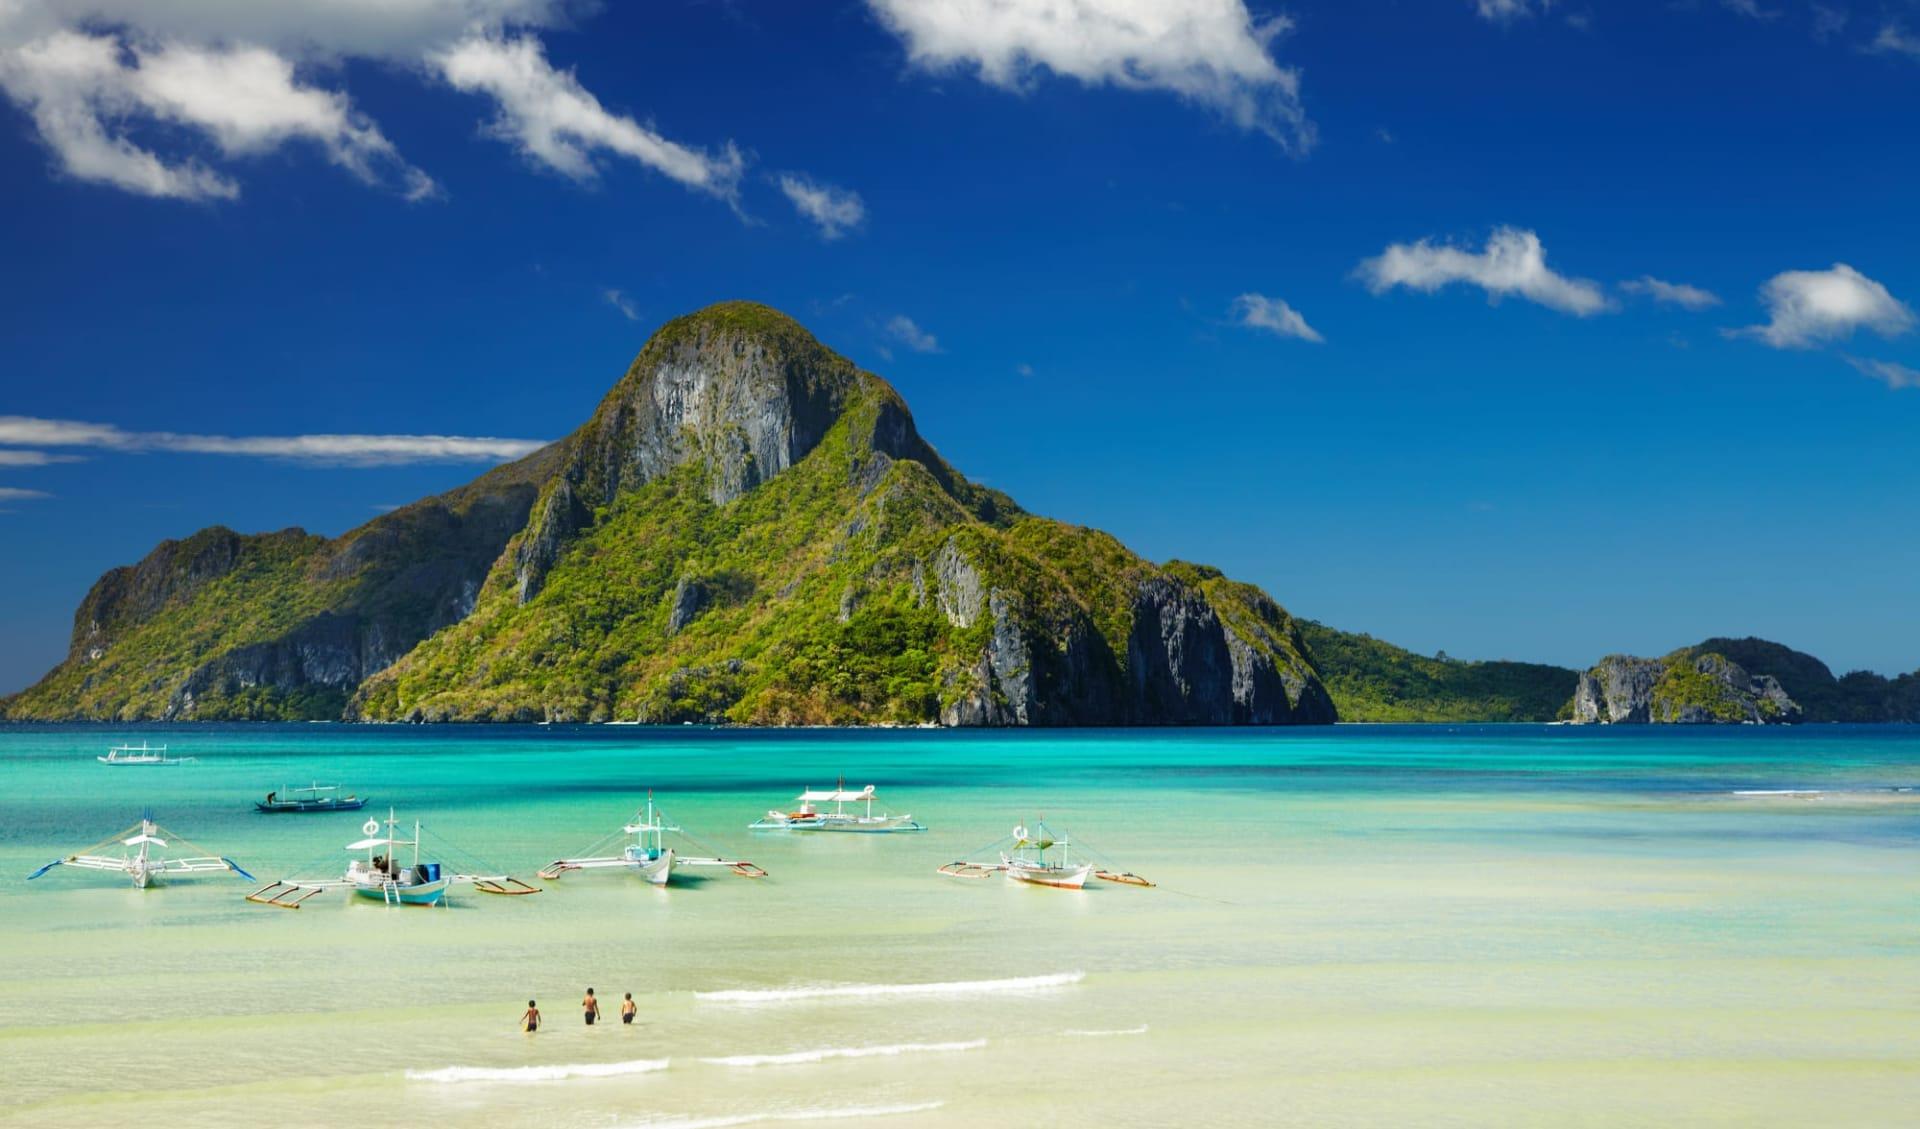 Individuelles Inselhüpfen auf den Philippinen ab Manila: Palawan El Nido bay and Cadlao island